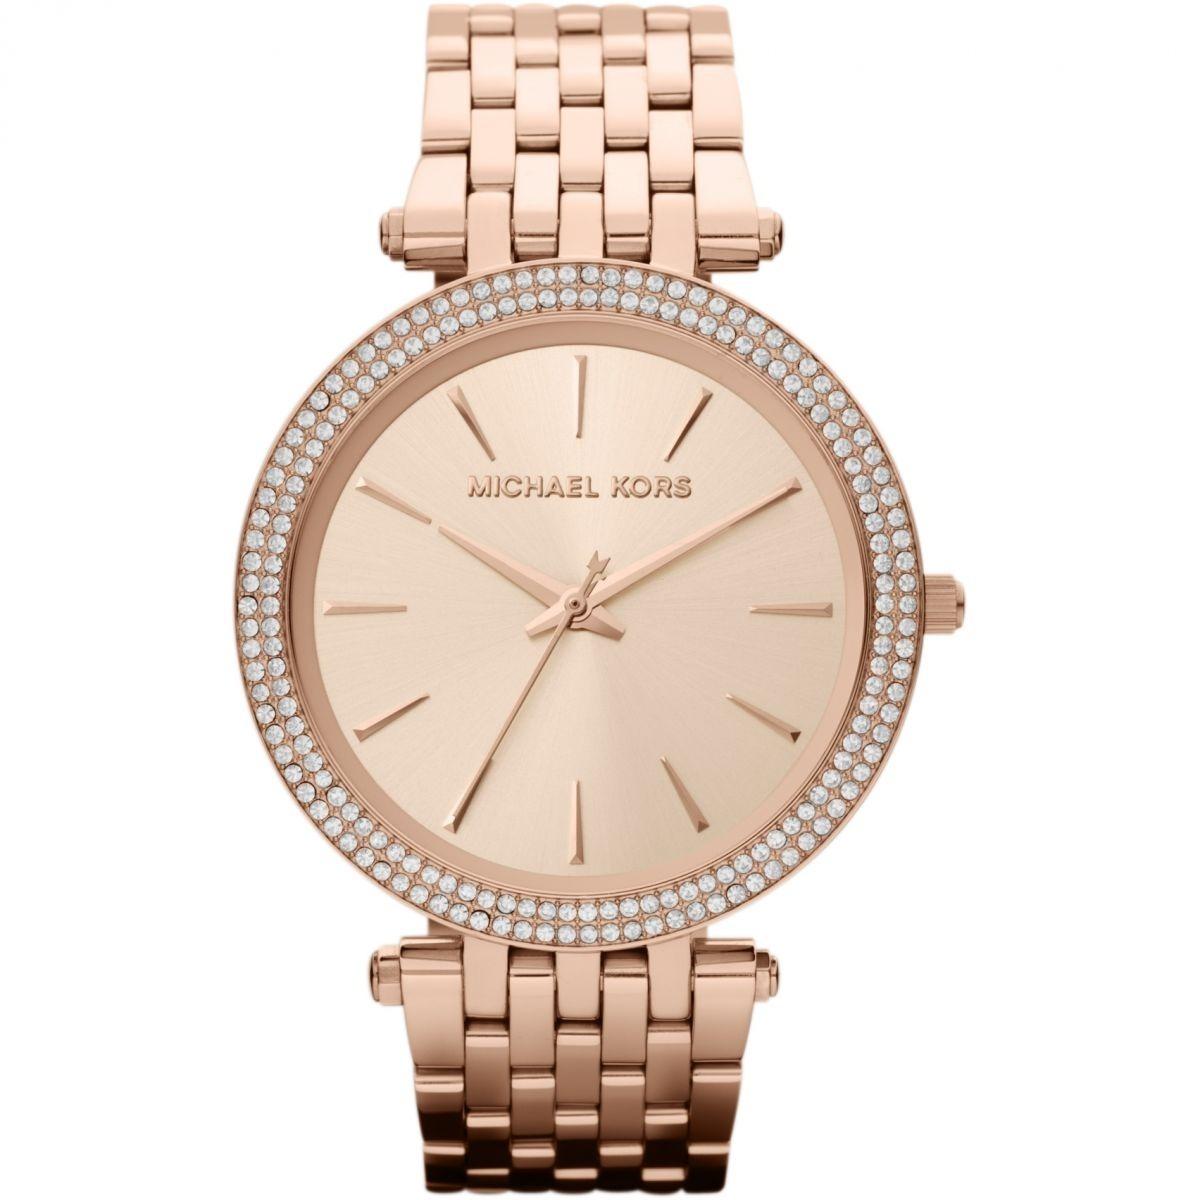 62d16108a51d reloj michael kors darci mk3192 oro rosa dama original. Cargando zoom.